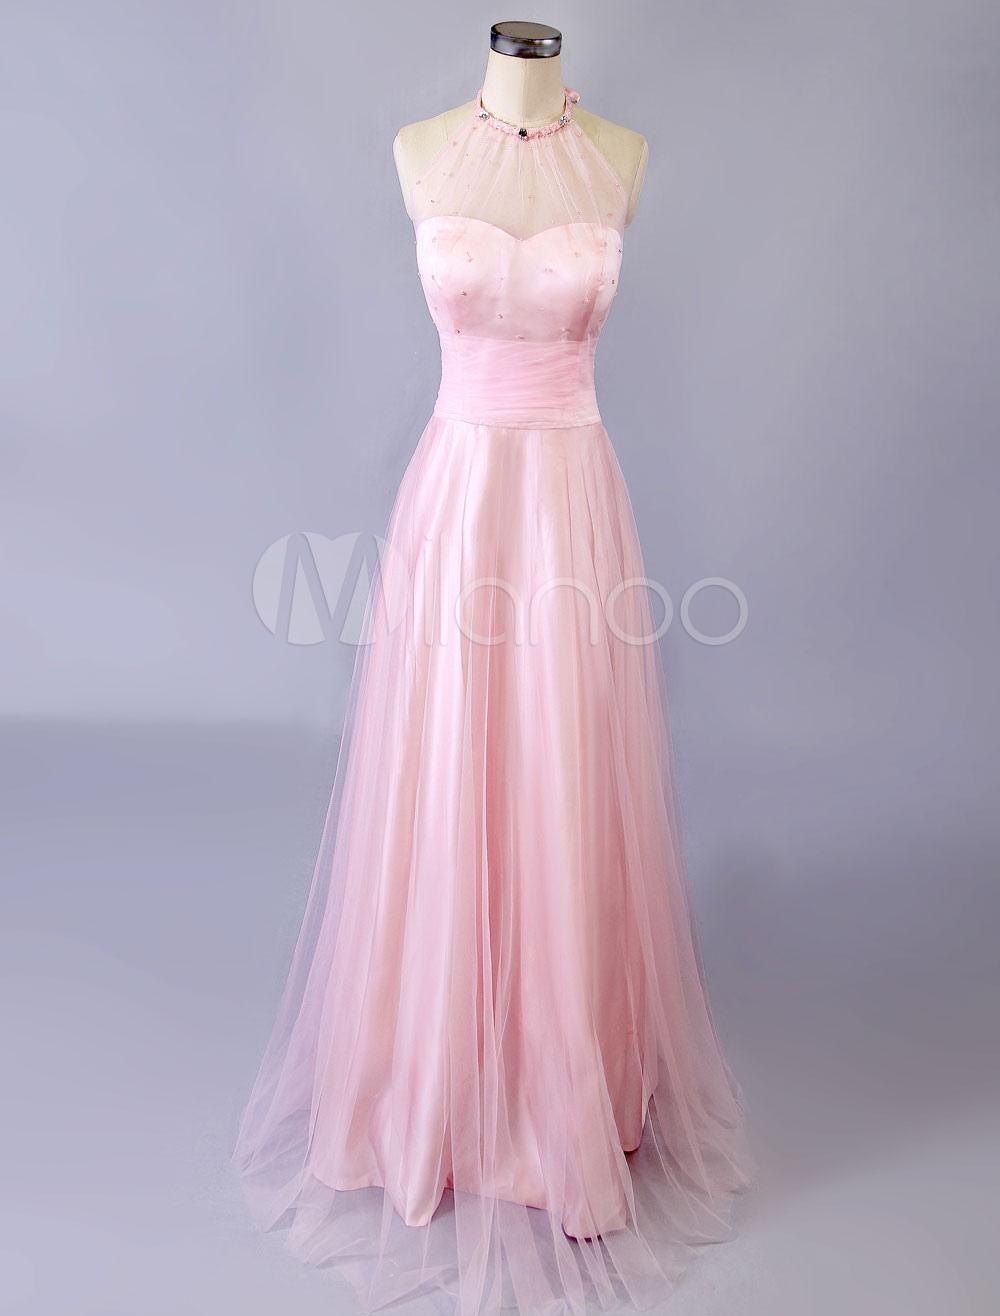 Pink Prom Dress 2018 Halter Illusion Backless Tulle Dress (Wedding Prom Dresses) photo